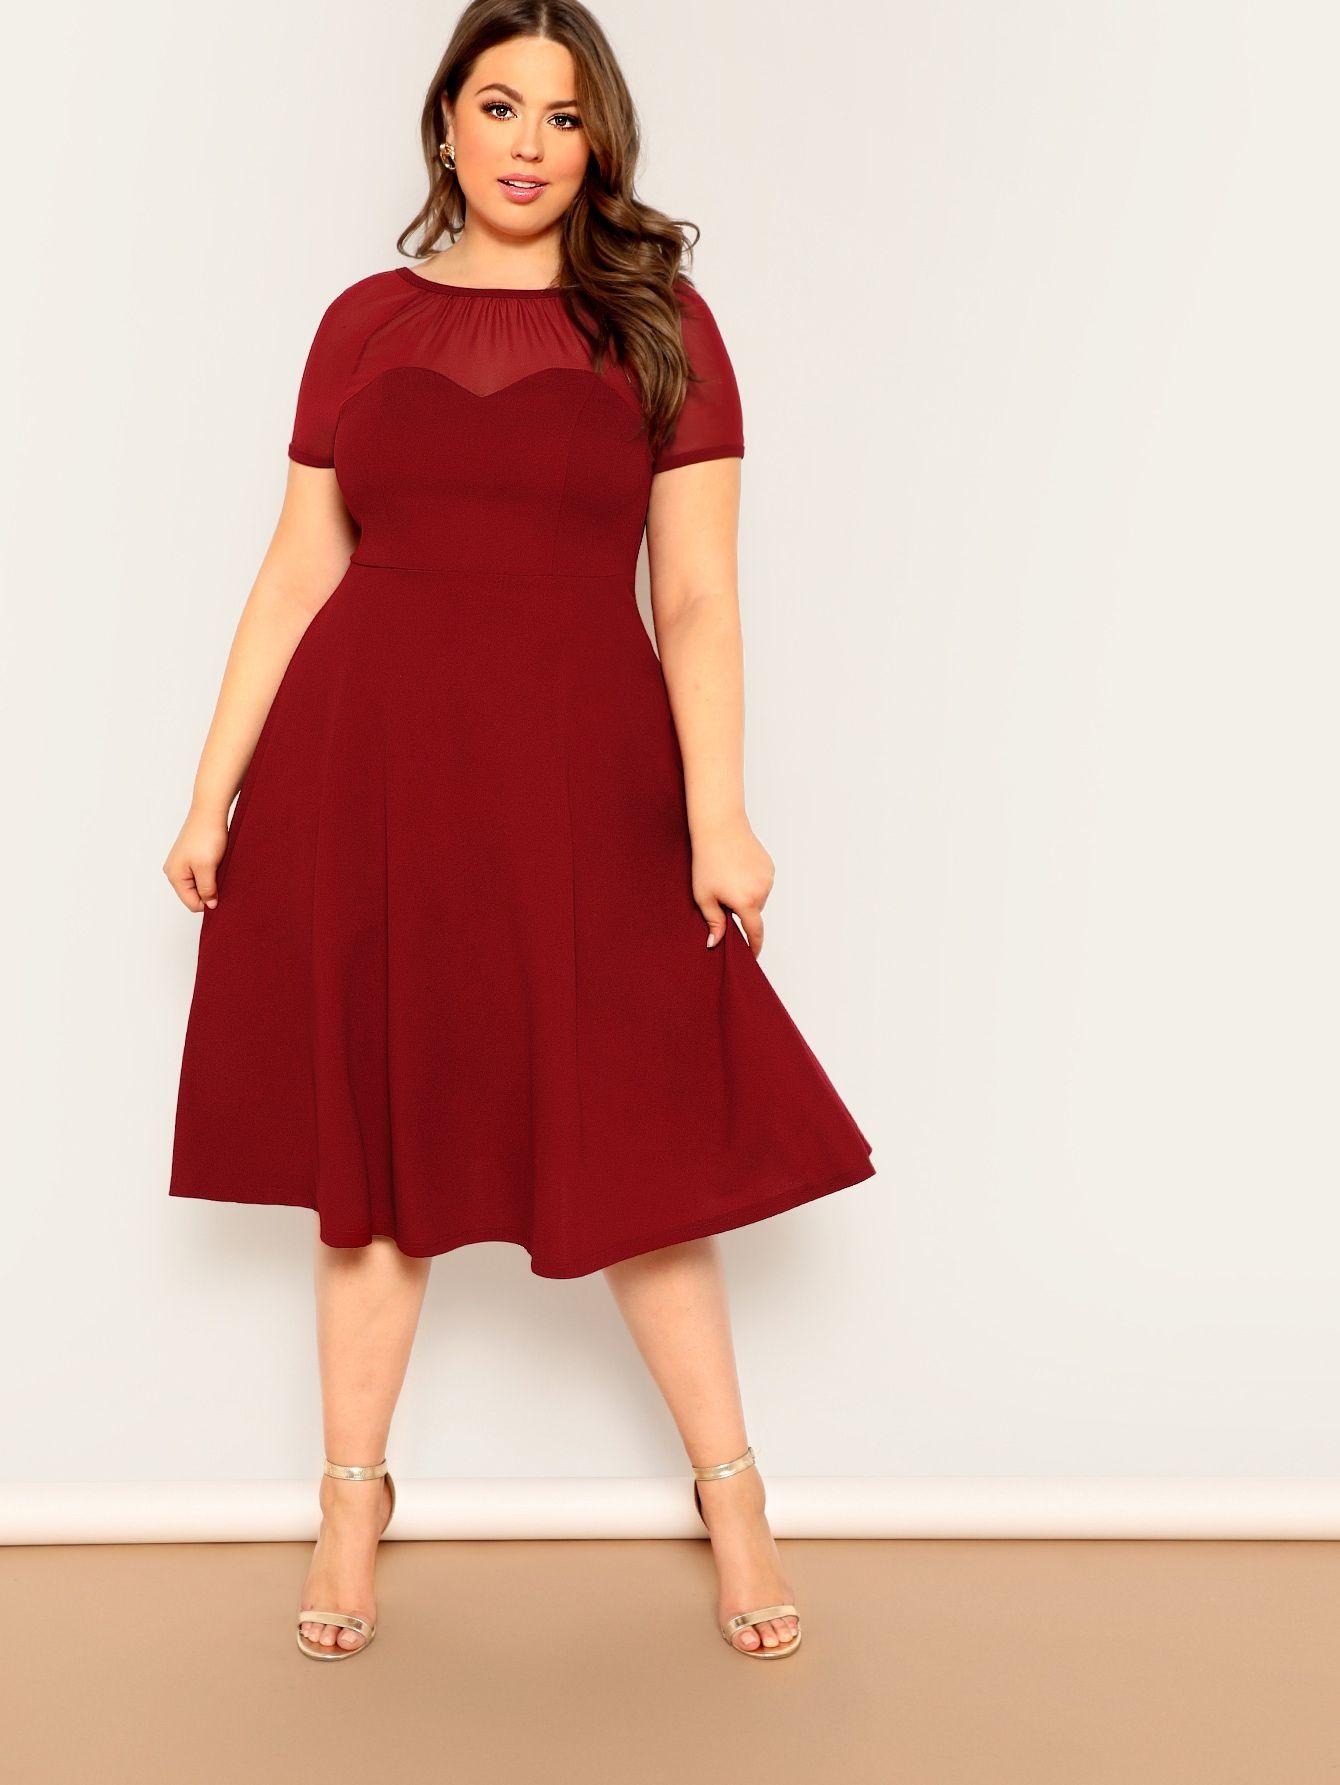 Plus V Back Mesh Sweetheart Dress Plus Size Dresses Flare Dress Fit Flare Dress [ 1785 x 1340 Pixel ]